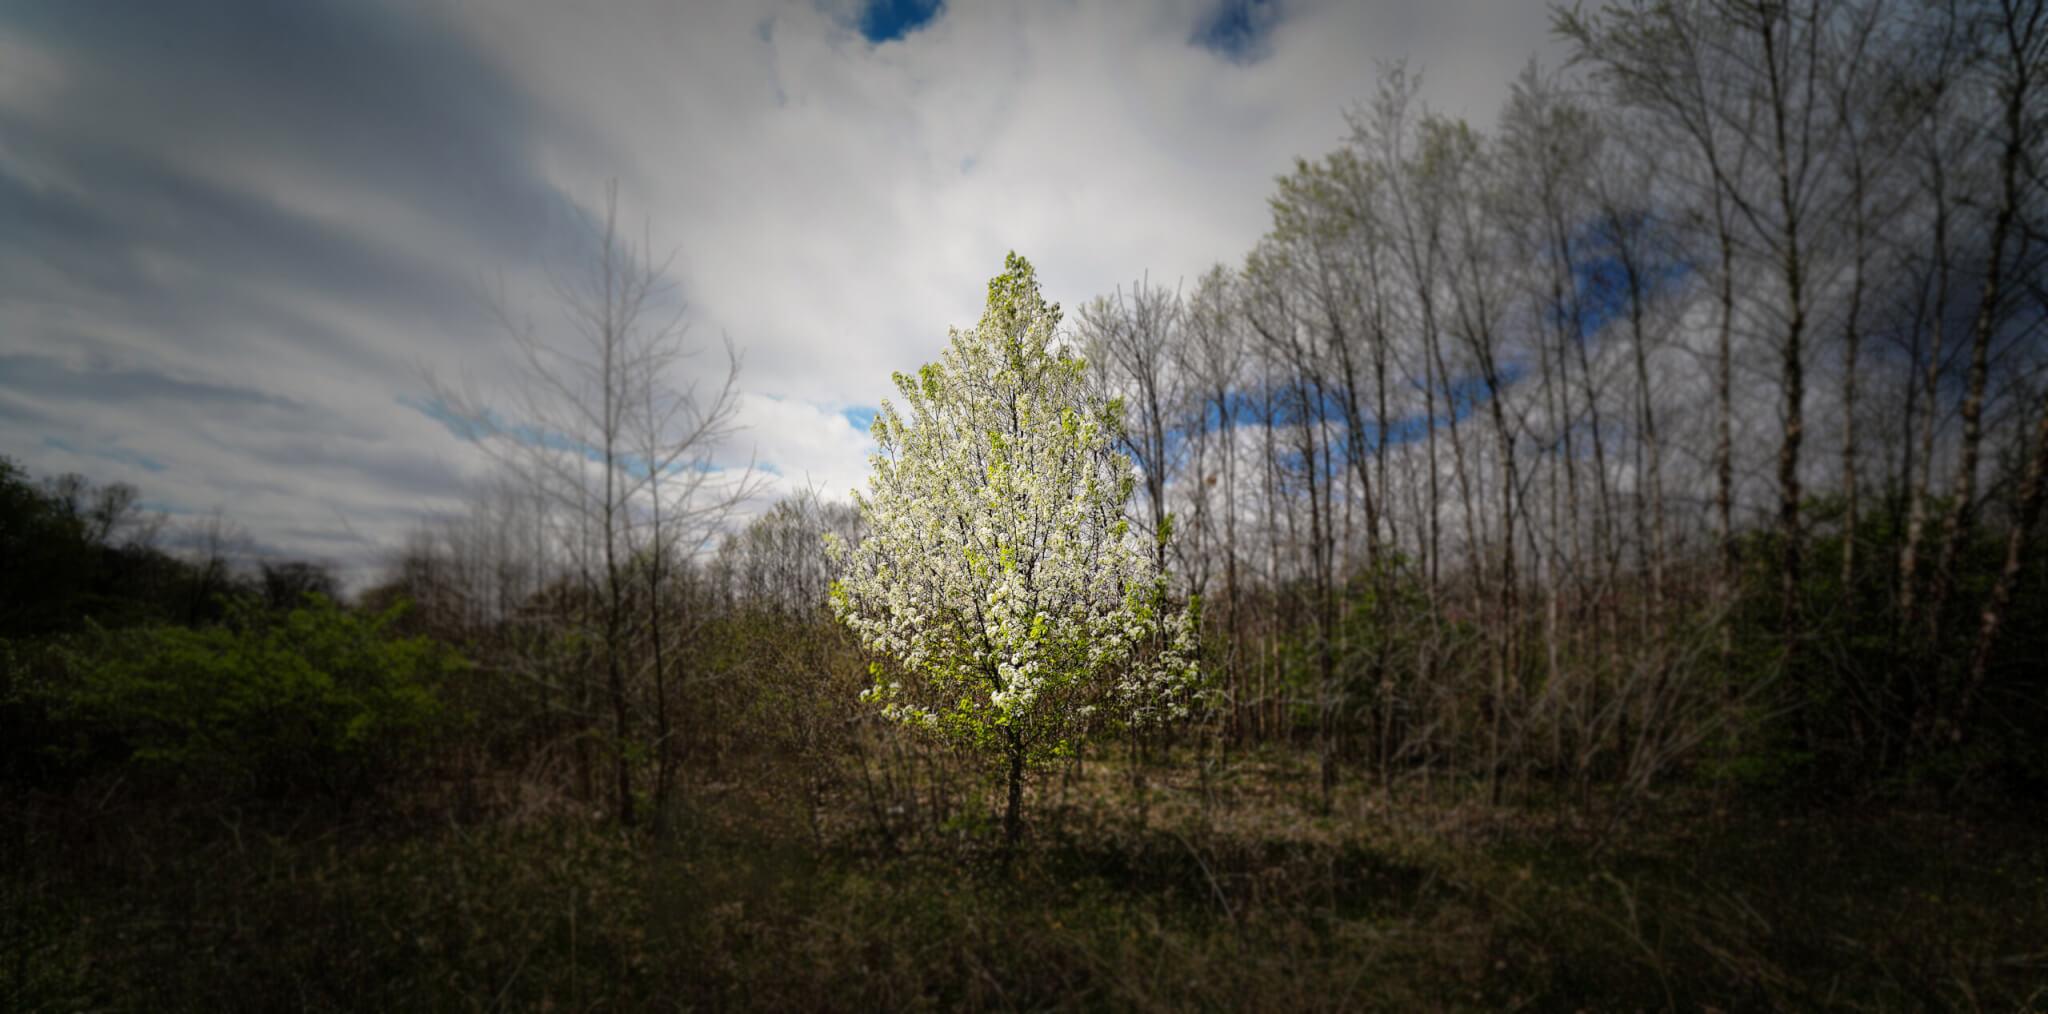 A lone pear tree